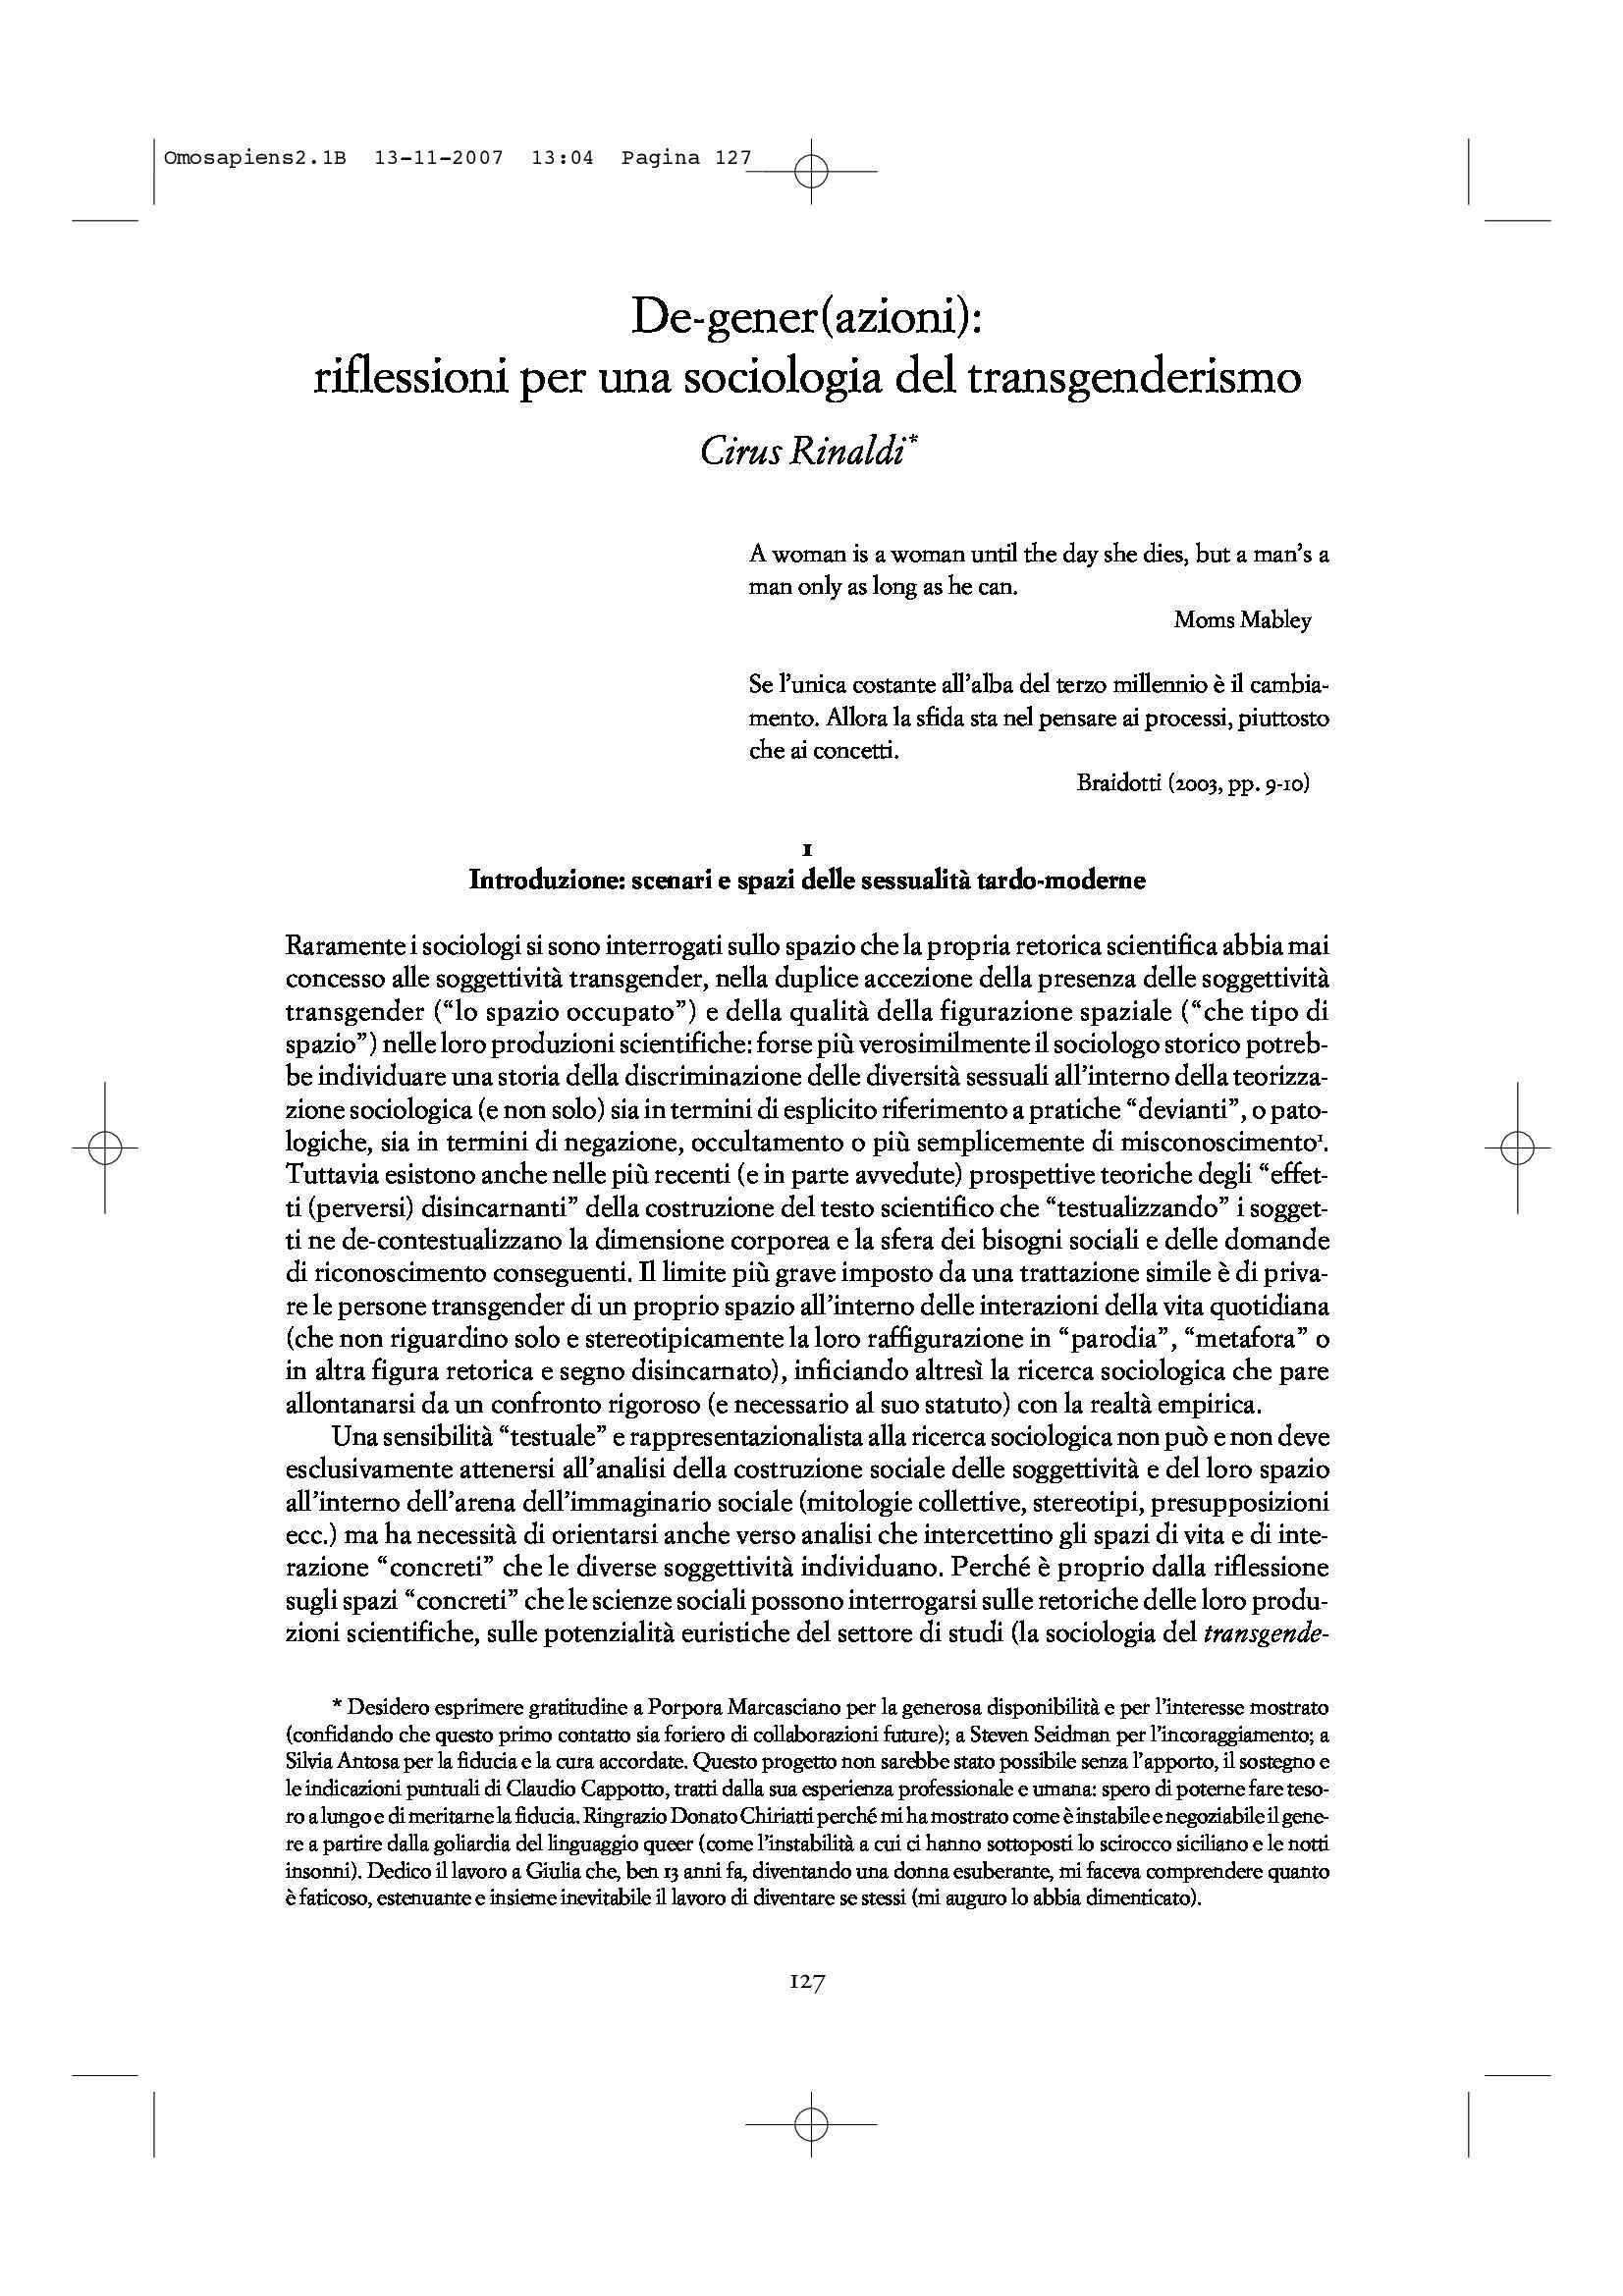 Sociologia del transgenderismo